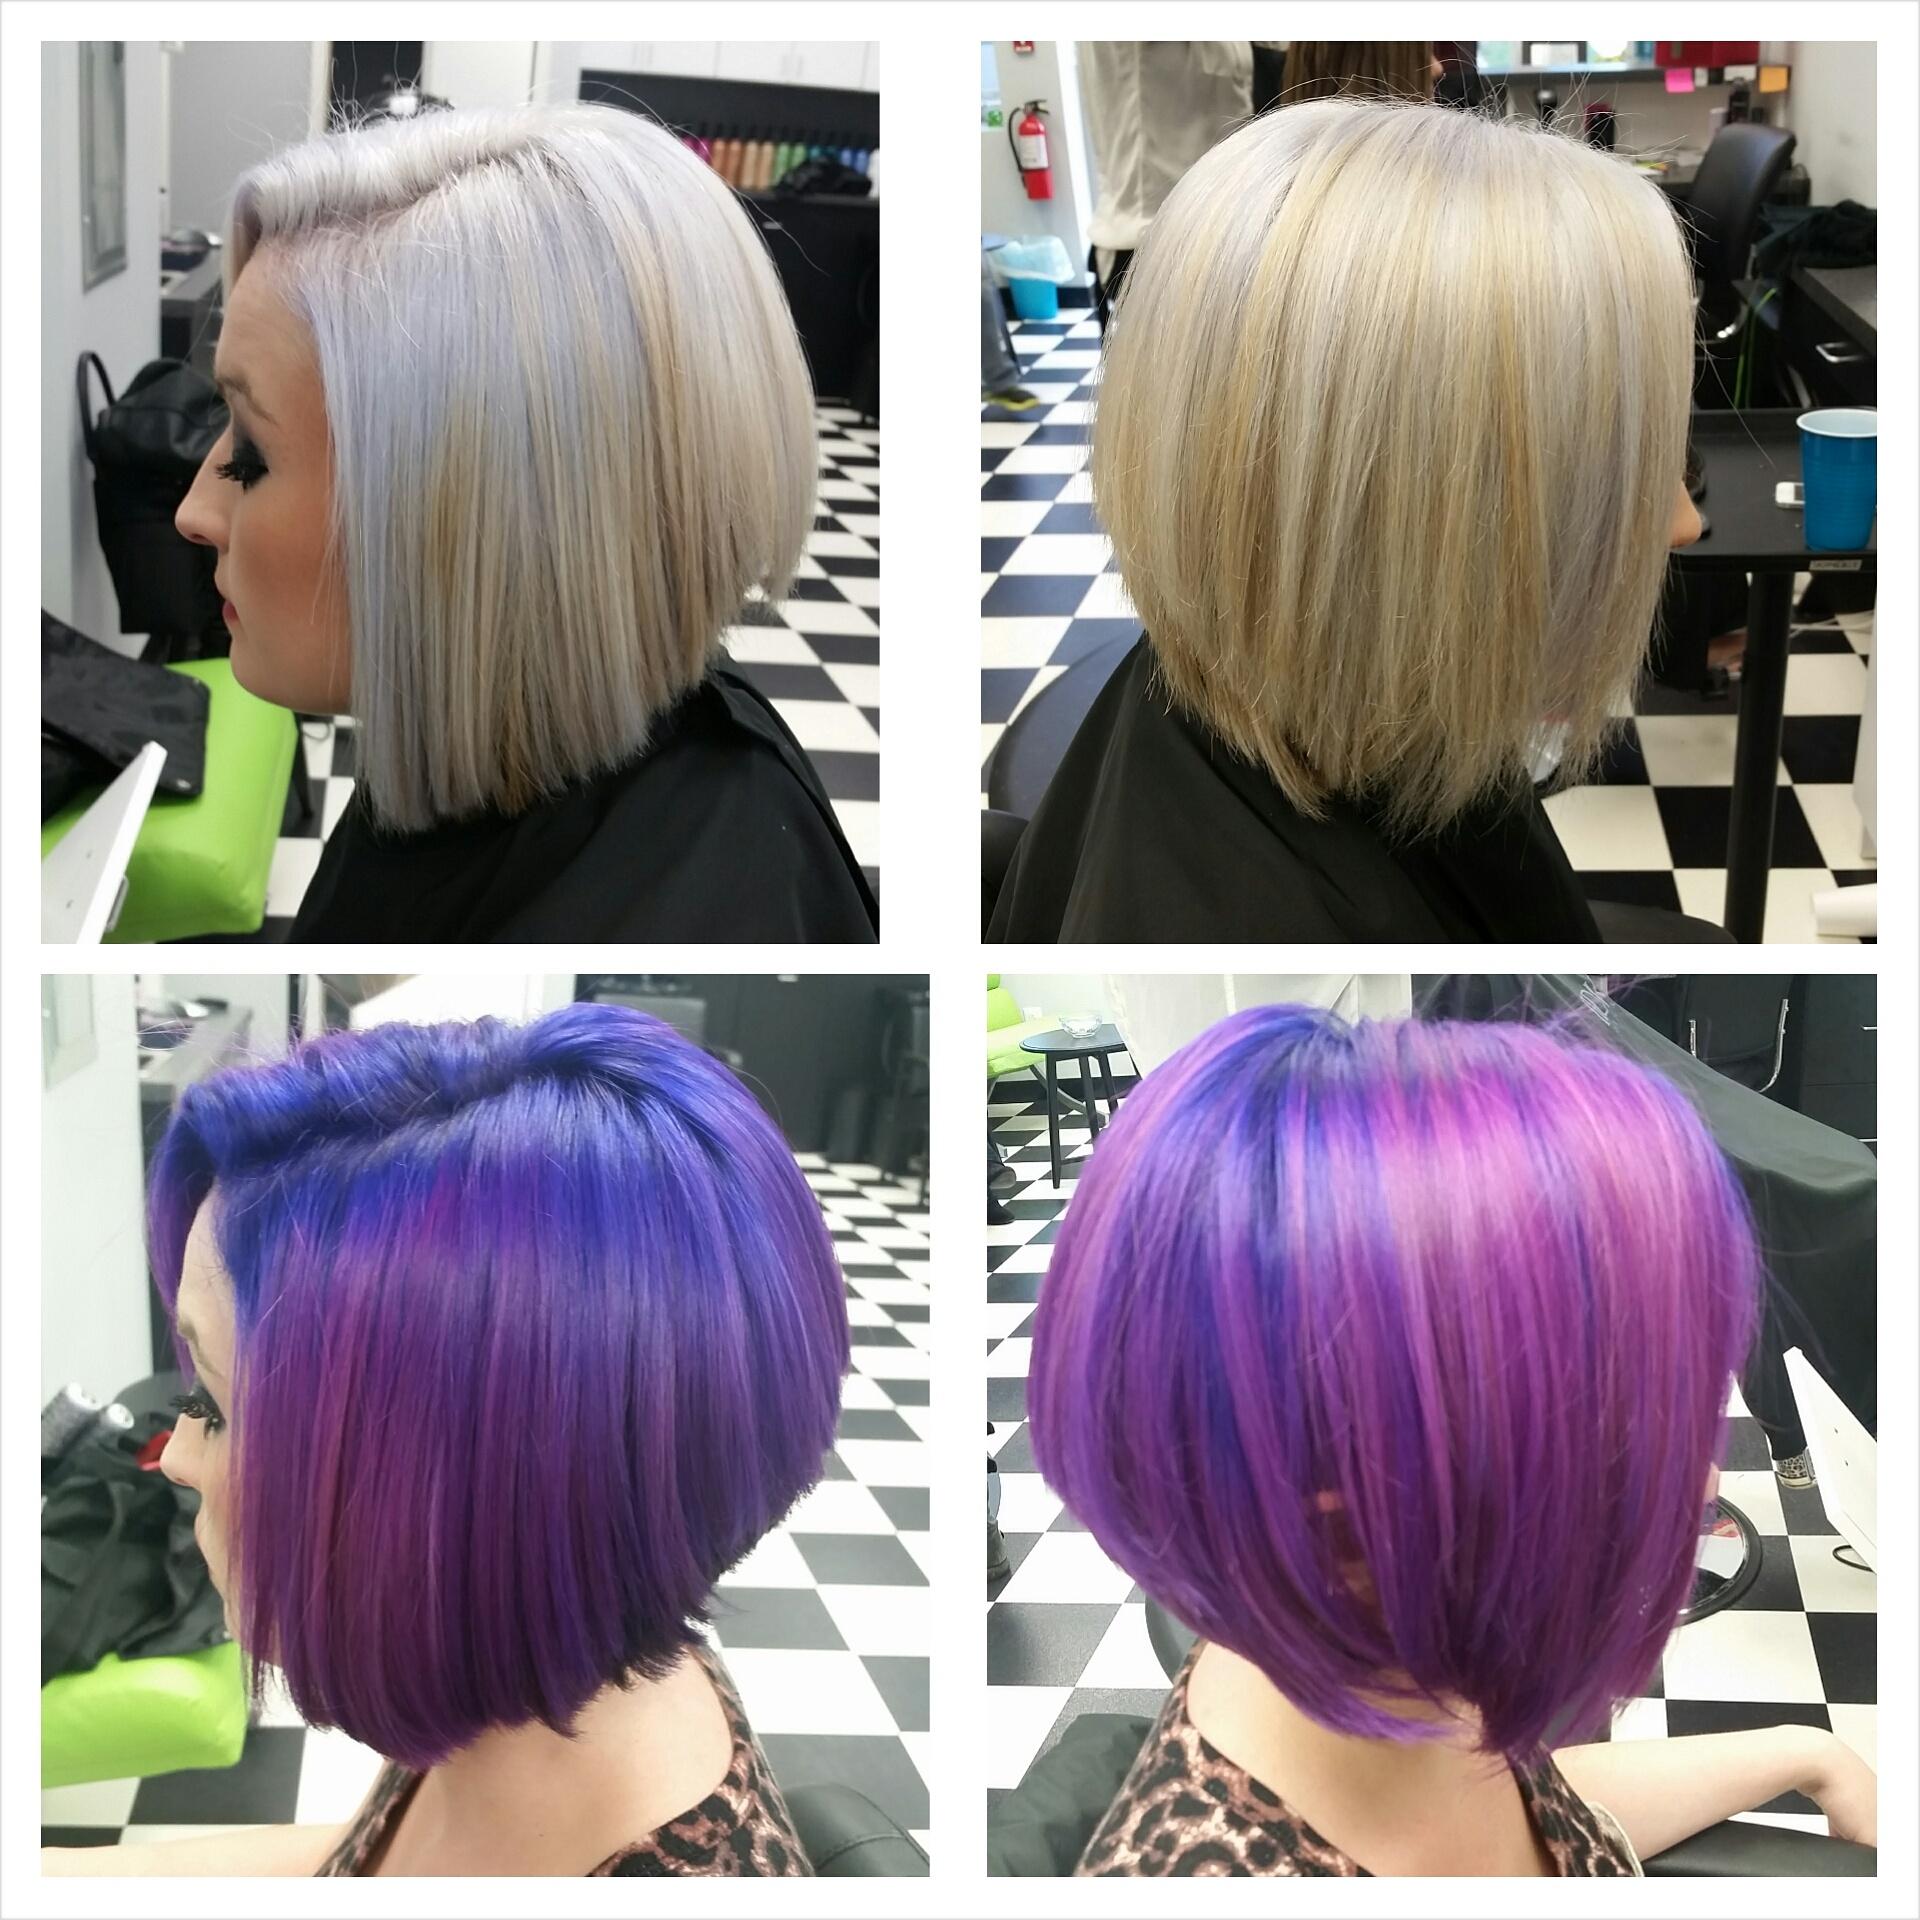 THE CHANGE UP: Platinum To Purple/Violet Dimension